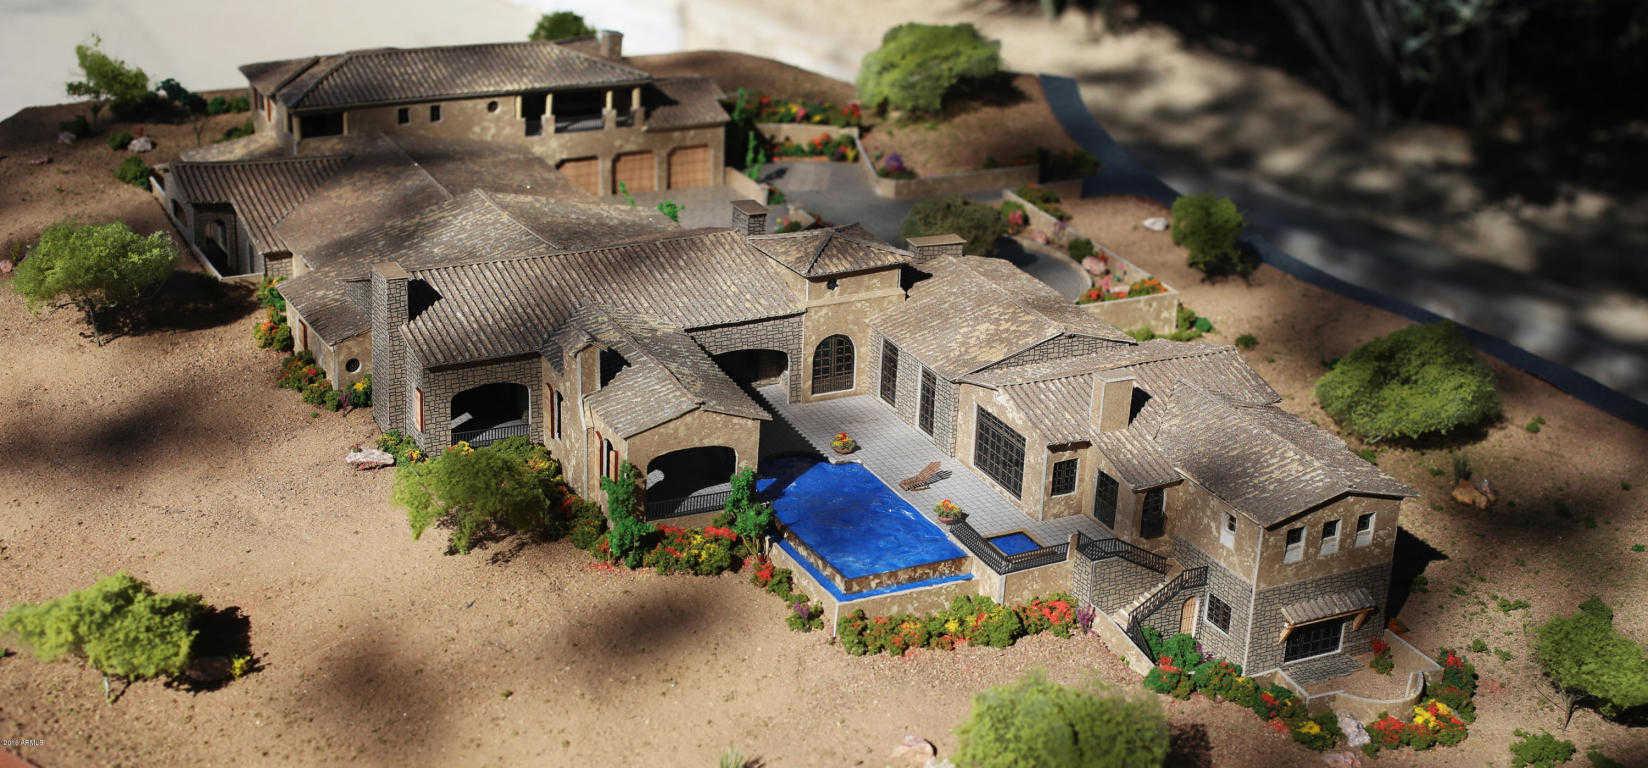 $8,100,000 - 6Br/8Ba - Home for Sale in Silverleaf, Scottsdale